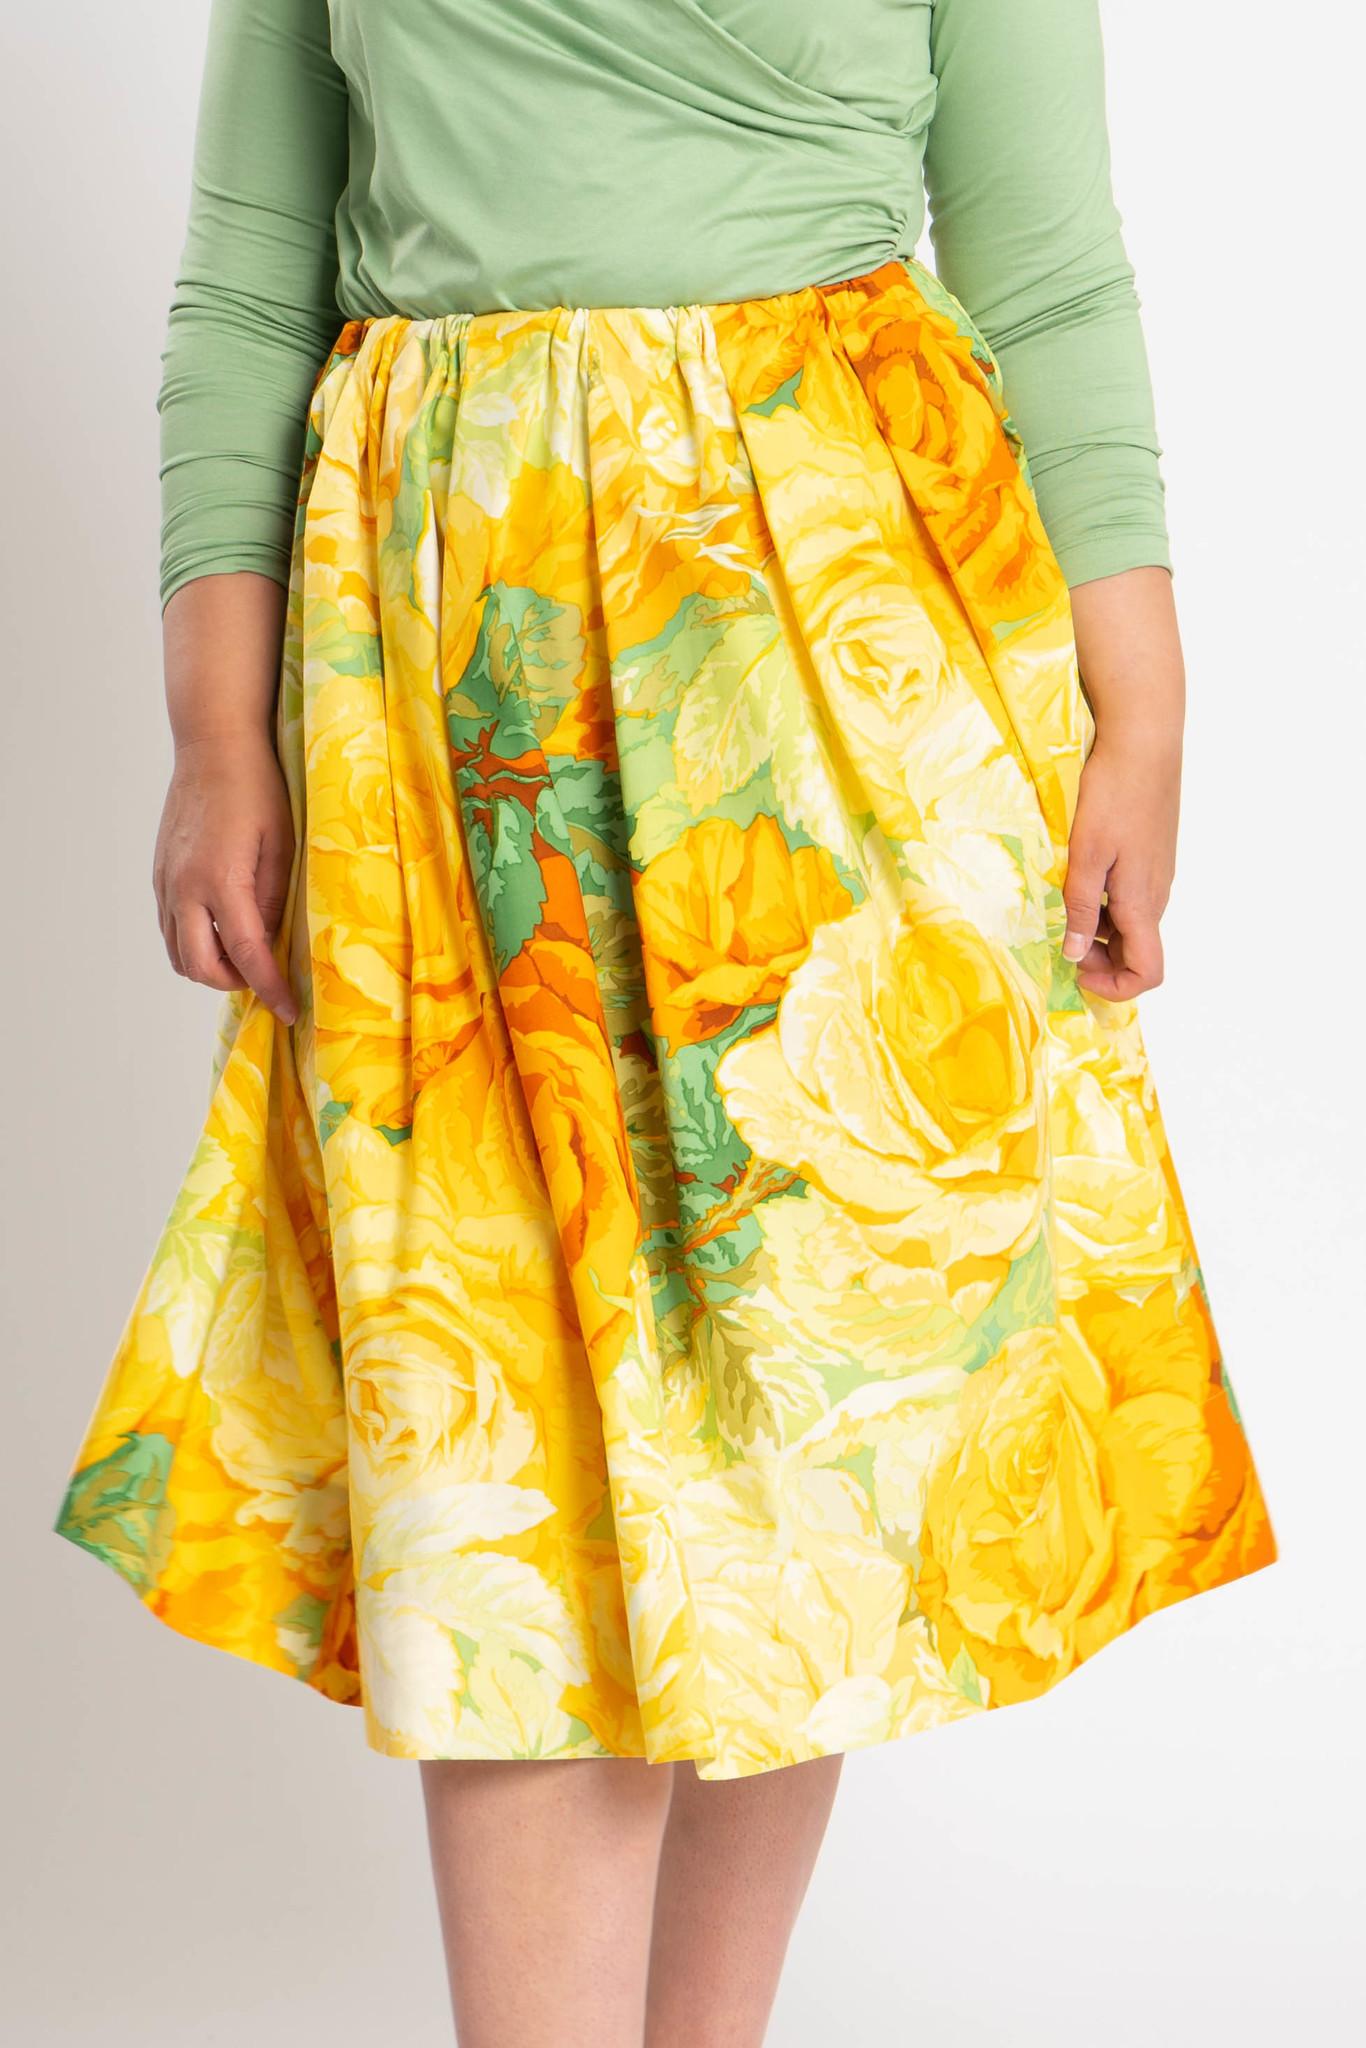 TULIP Skirt in Cotton-1